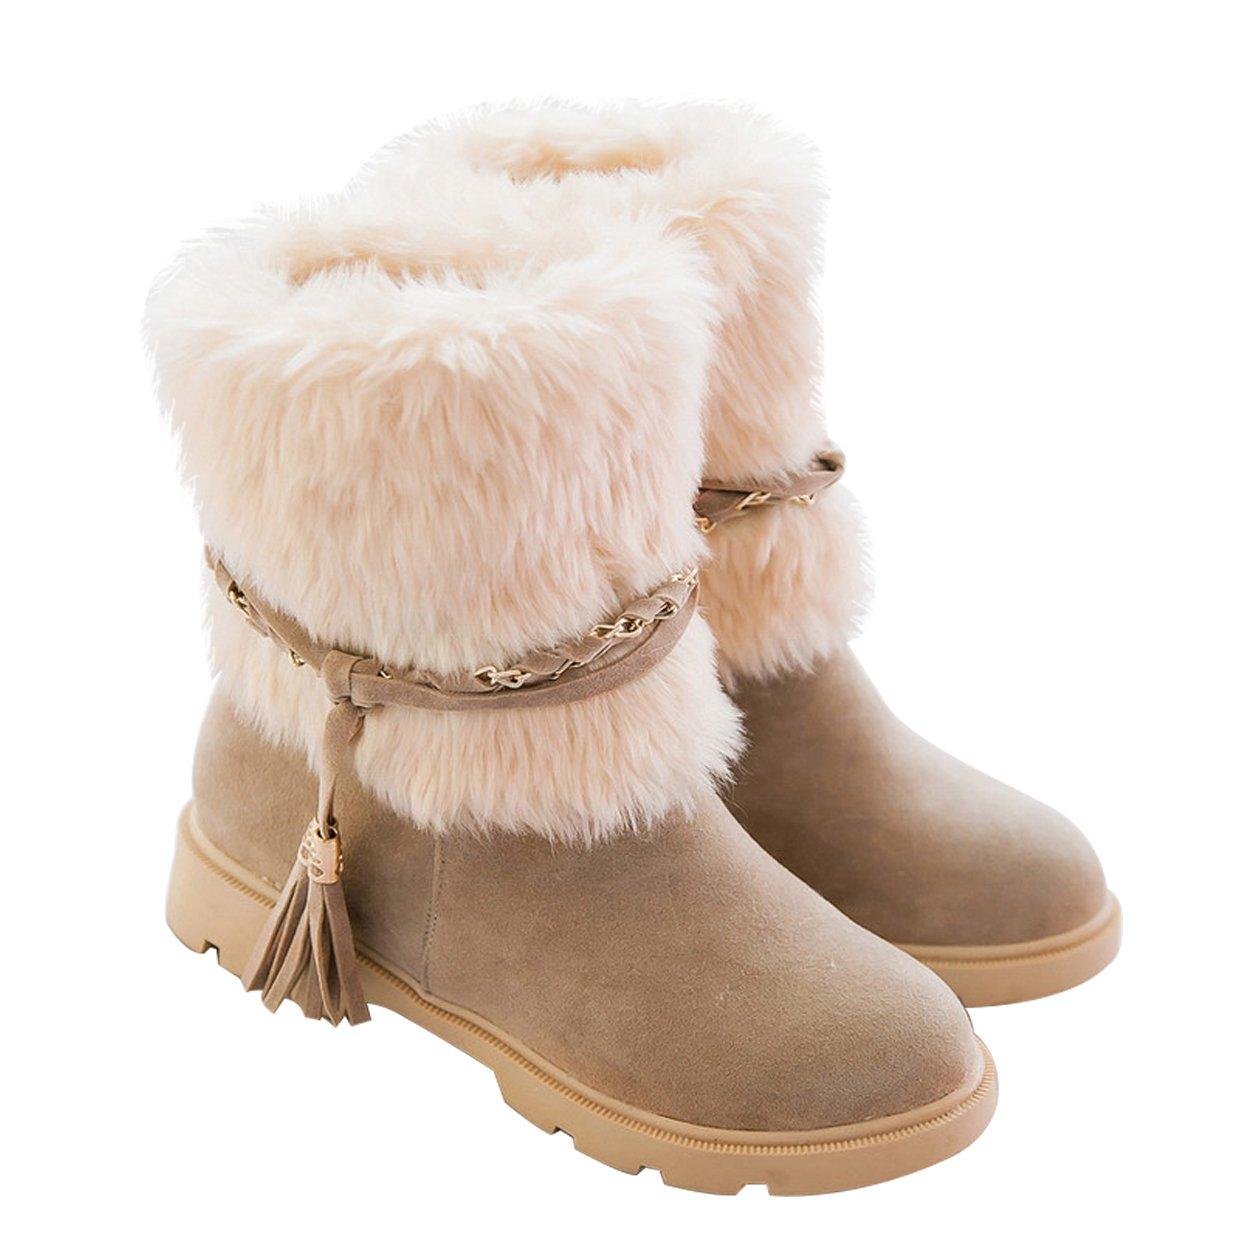 Susanny Women's Winter Fashion Warm Short Booties Casual Outdoor Suede Flat Heel Waterproof Faux Fur Beige Snow Boots 10.5 B (M) US